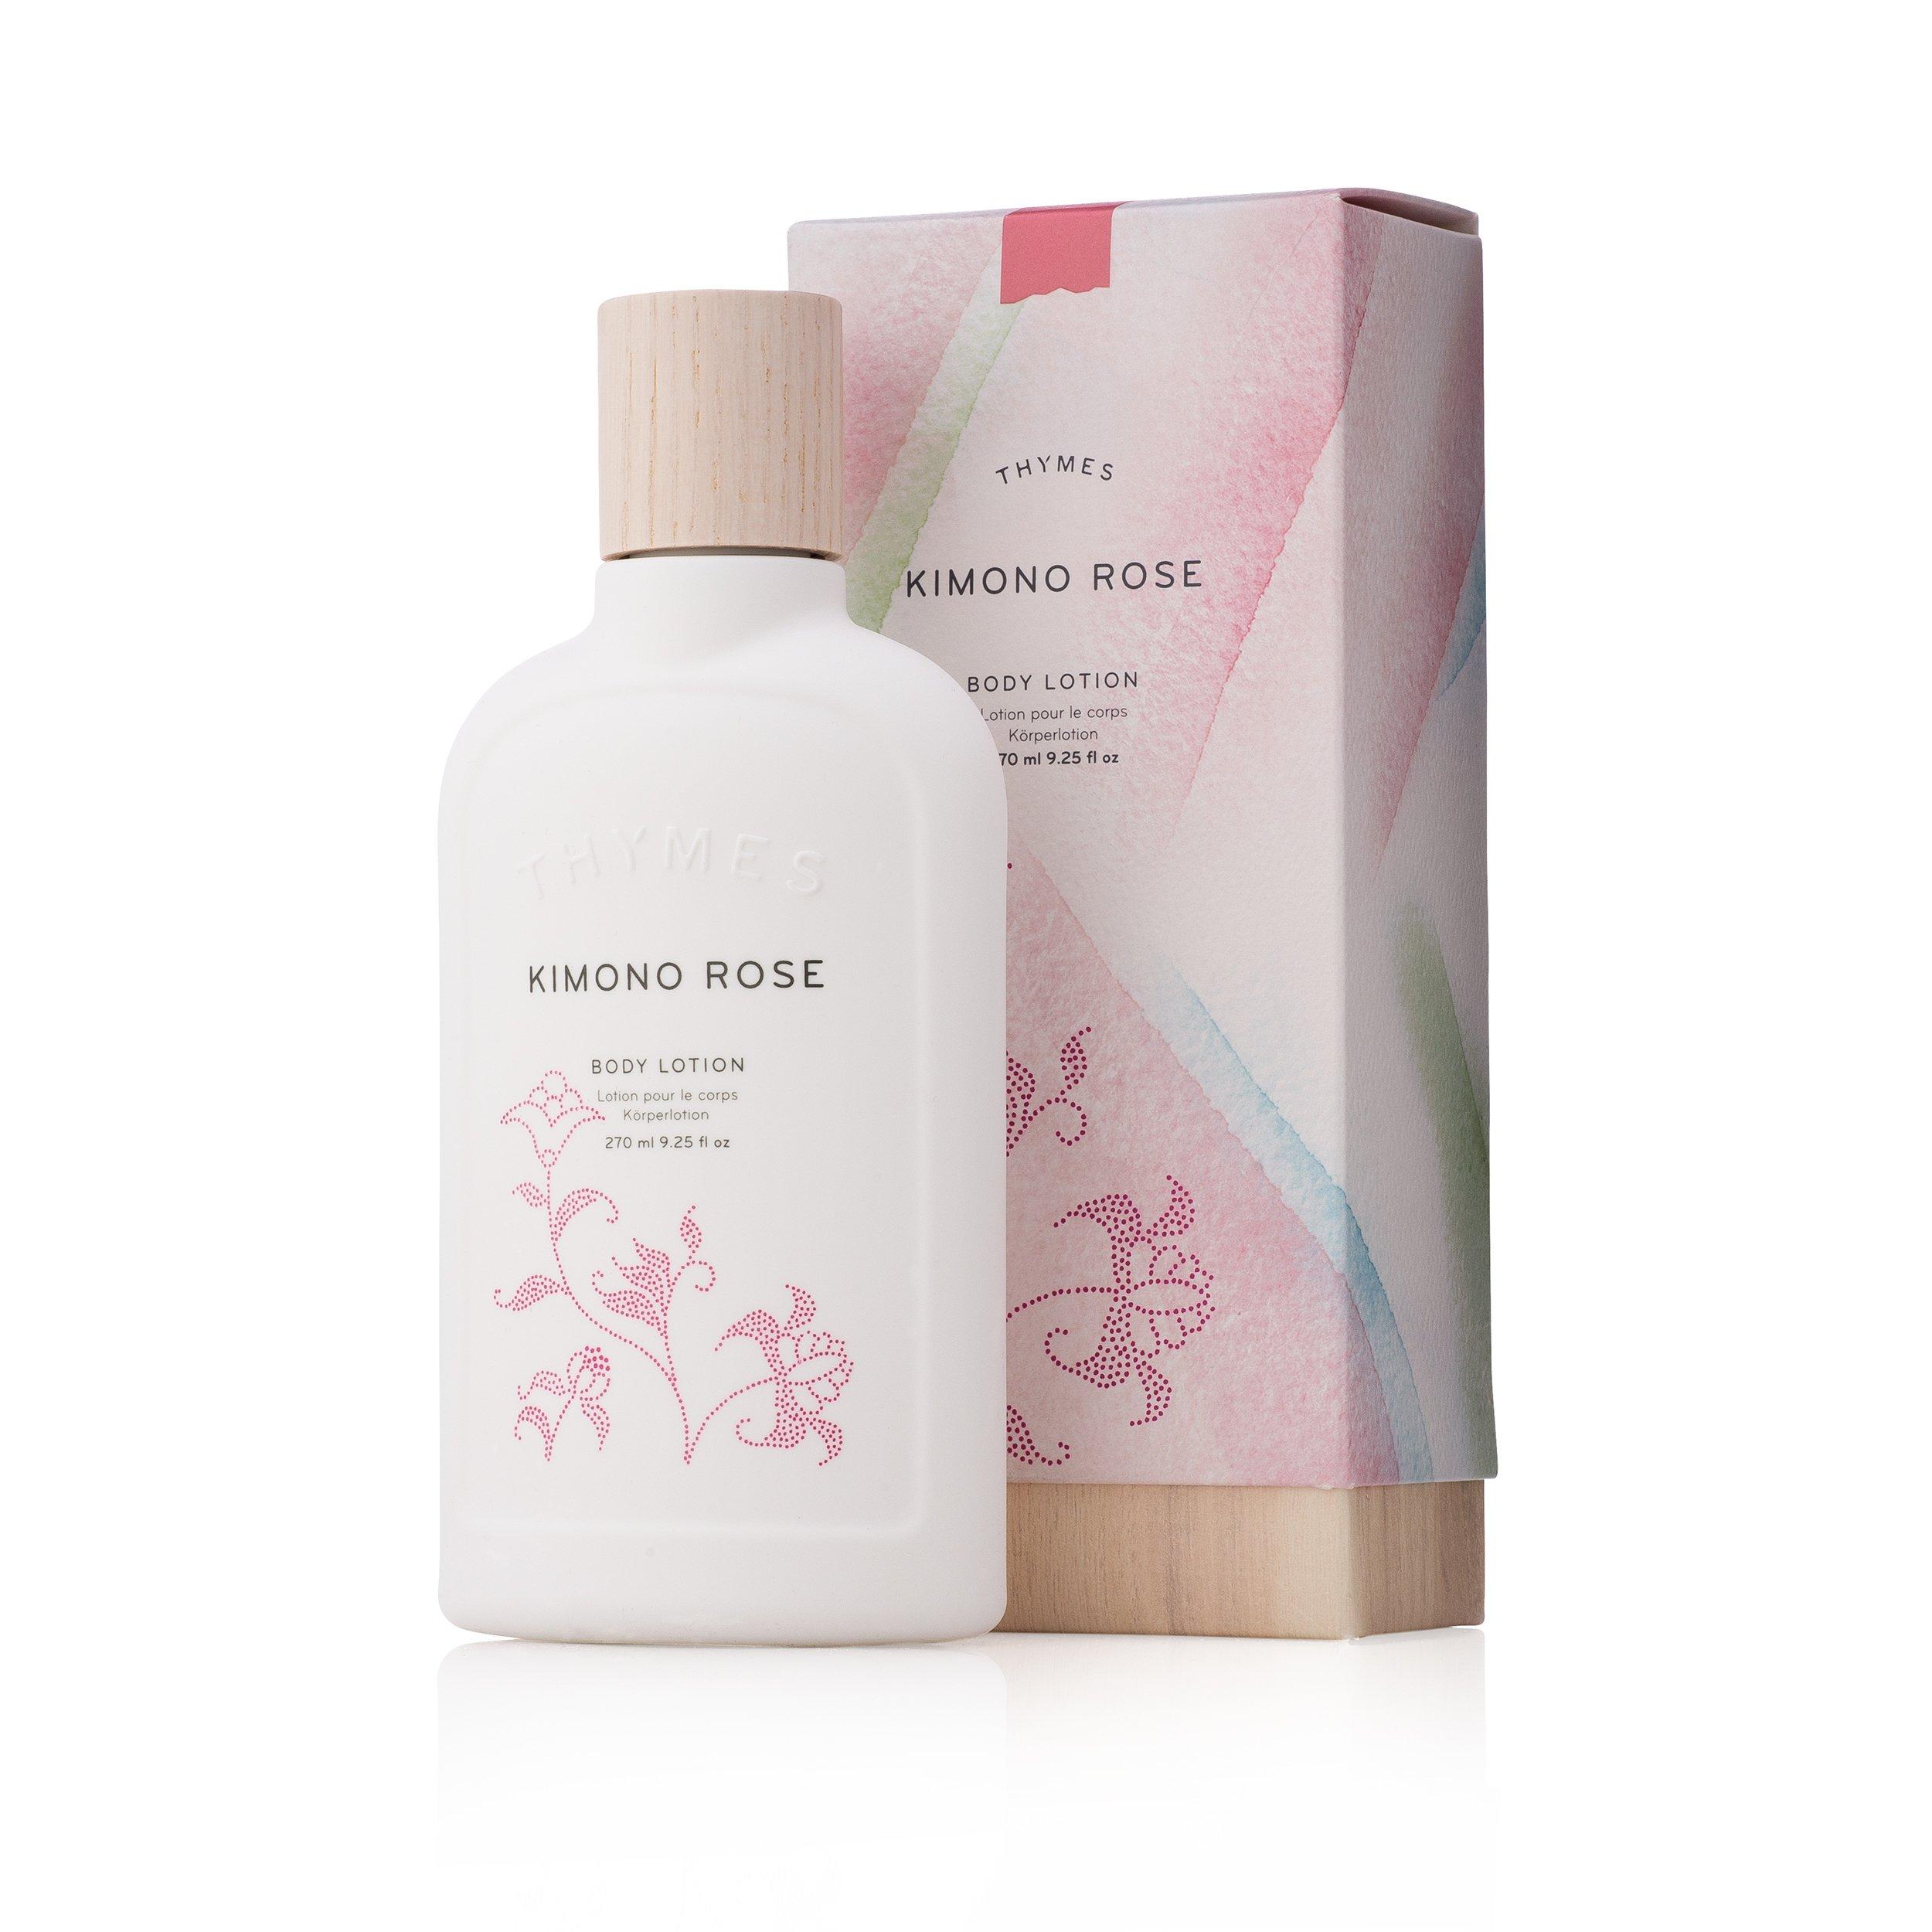 Amazon thymes kimono rose eau de parfum soft vanilla rose thymes kimono rose body lotion moisturizing with soft vanilla rose scent 925 oz izmirmasajfo